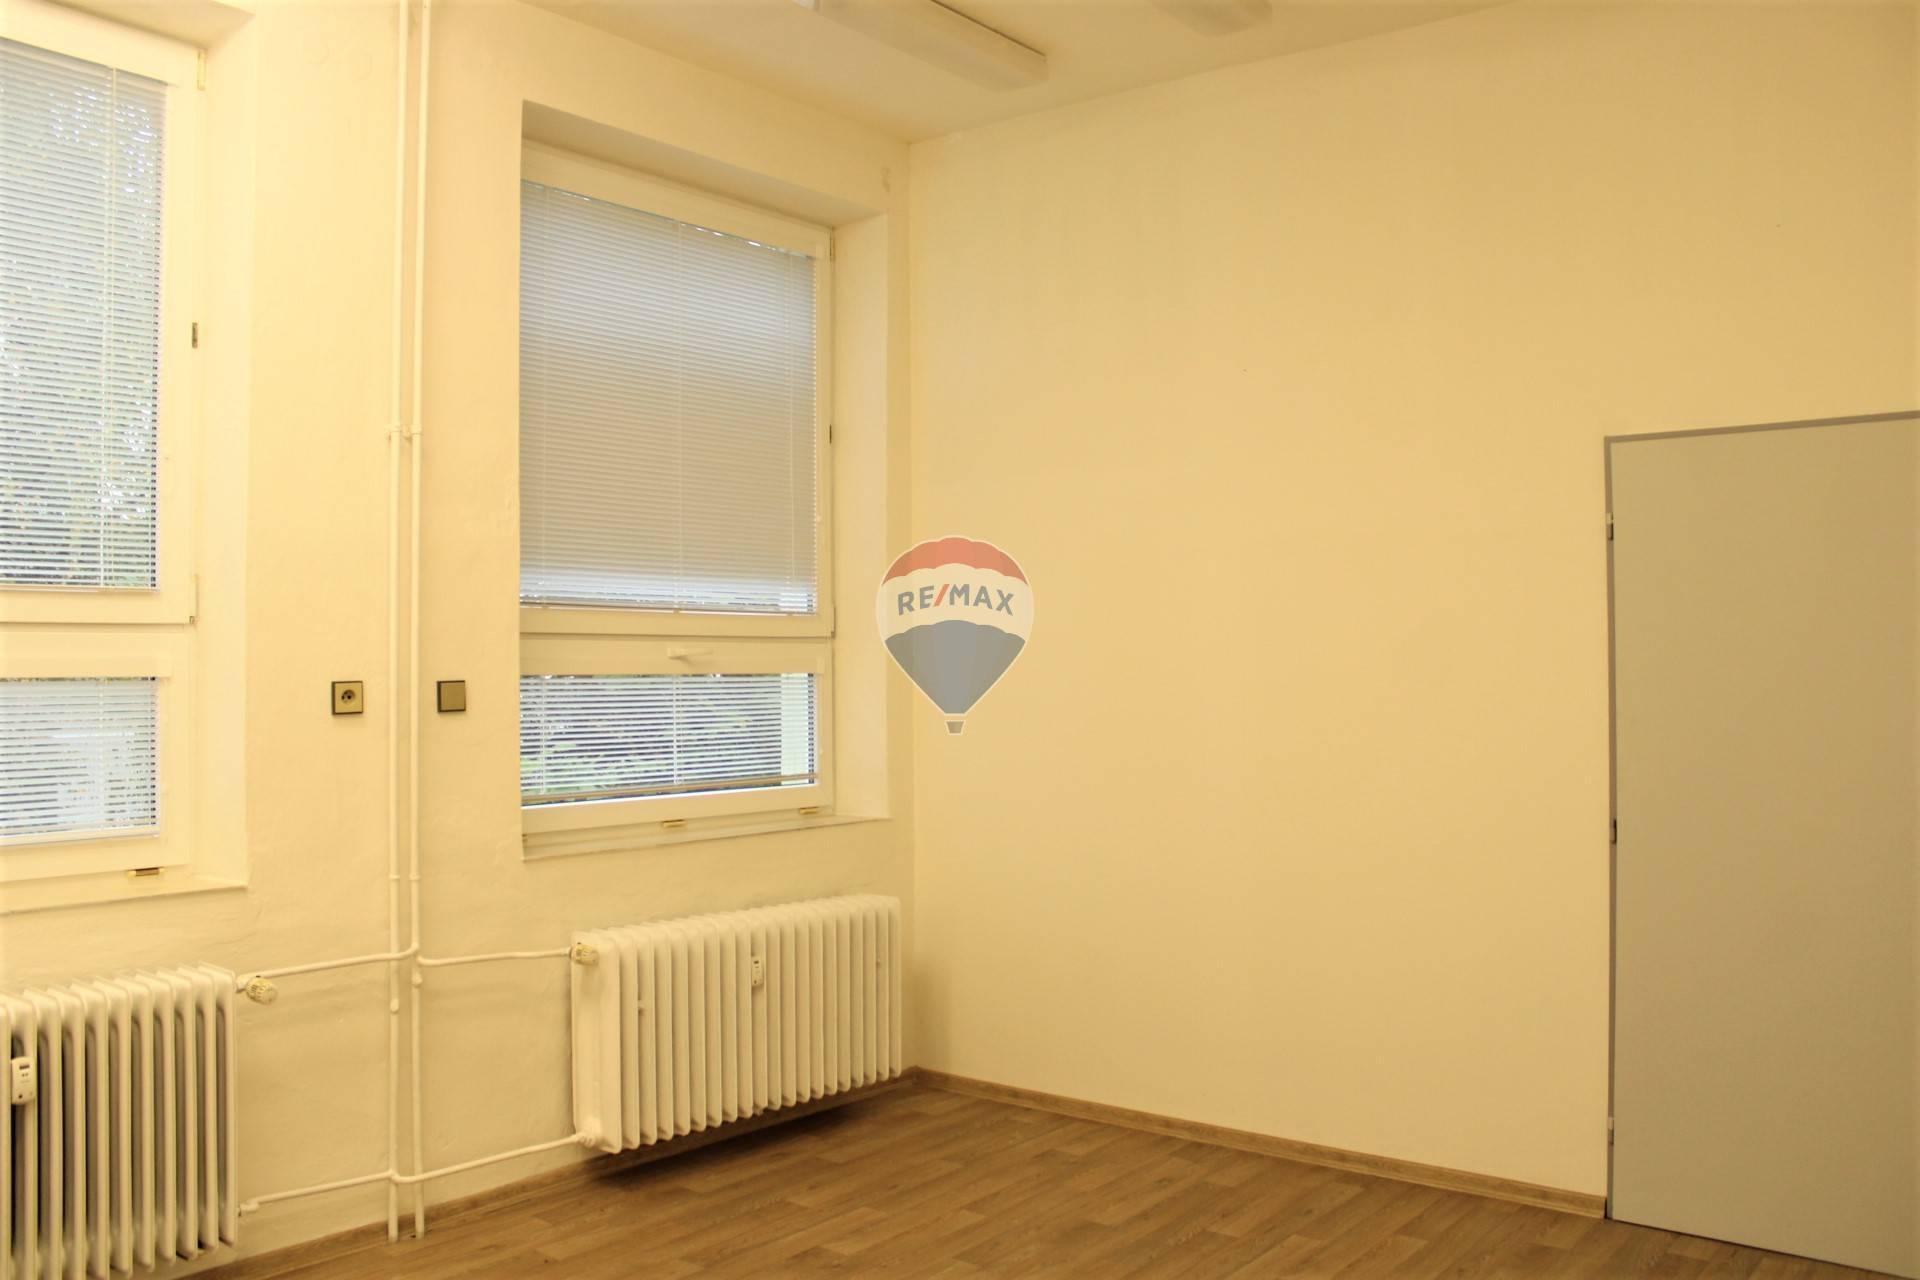 Prenájom, kancelársky priestor, Spišská Nová Ves, ul. Stará cesta,